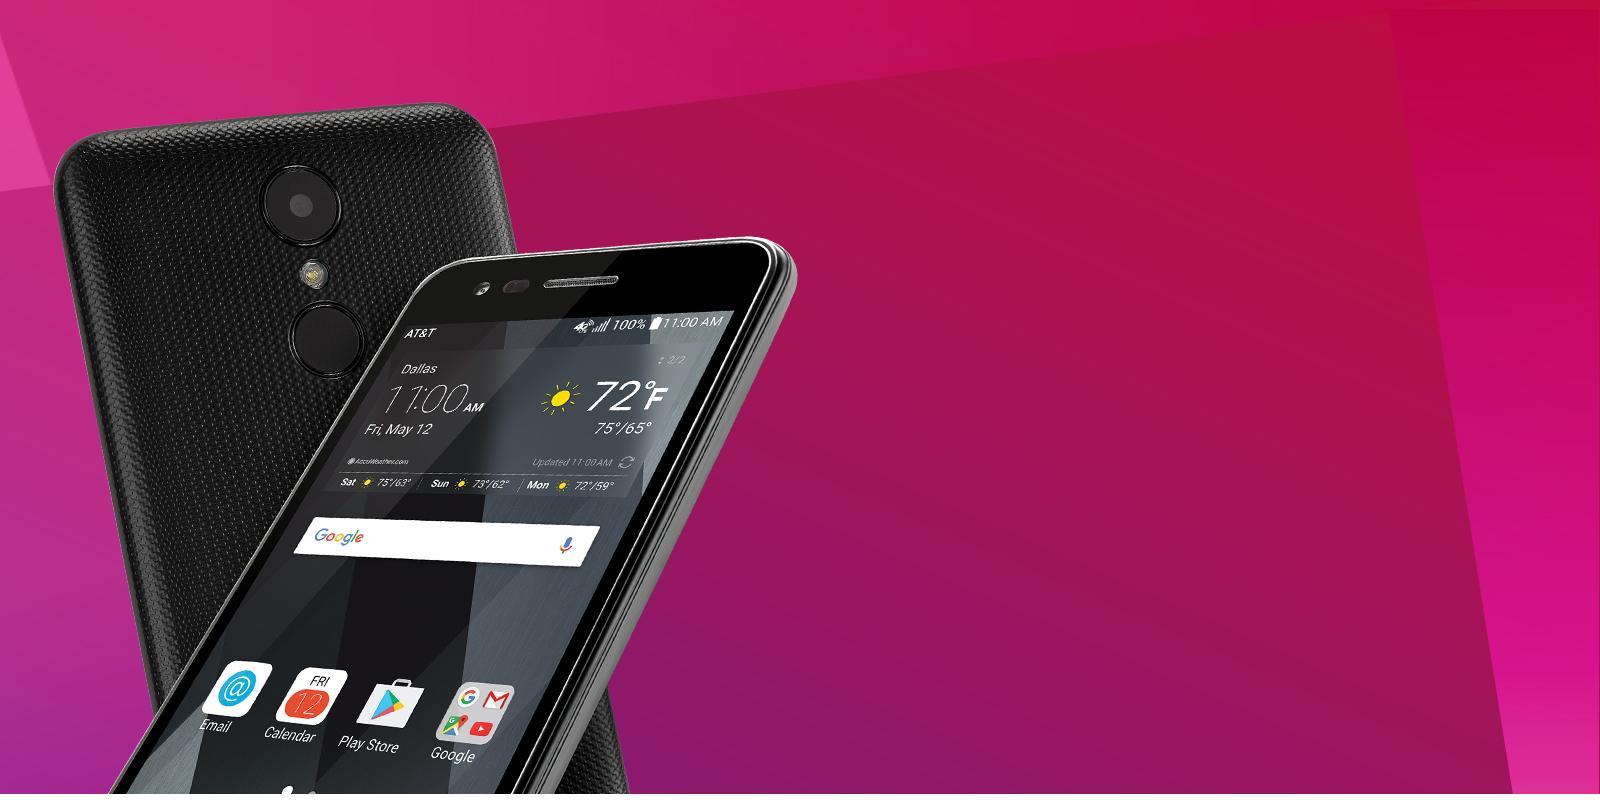 Lg Phoenix 3 Prepaid Go Smartphone For Att M150 Usa At Amp T Telephone Wiring Diagram 2500 5 Mp Autofocus Rear Camera